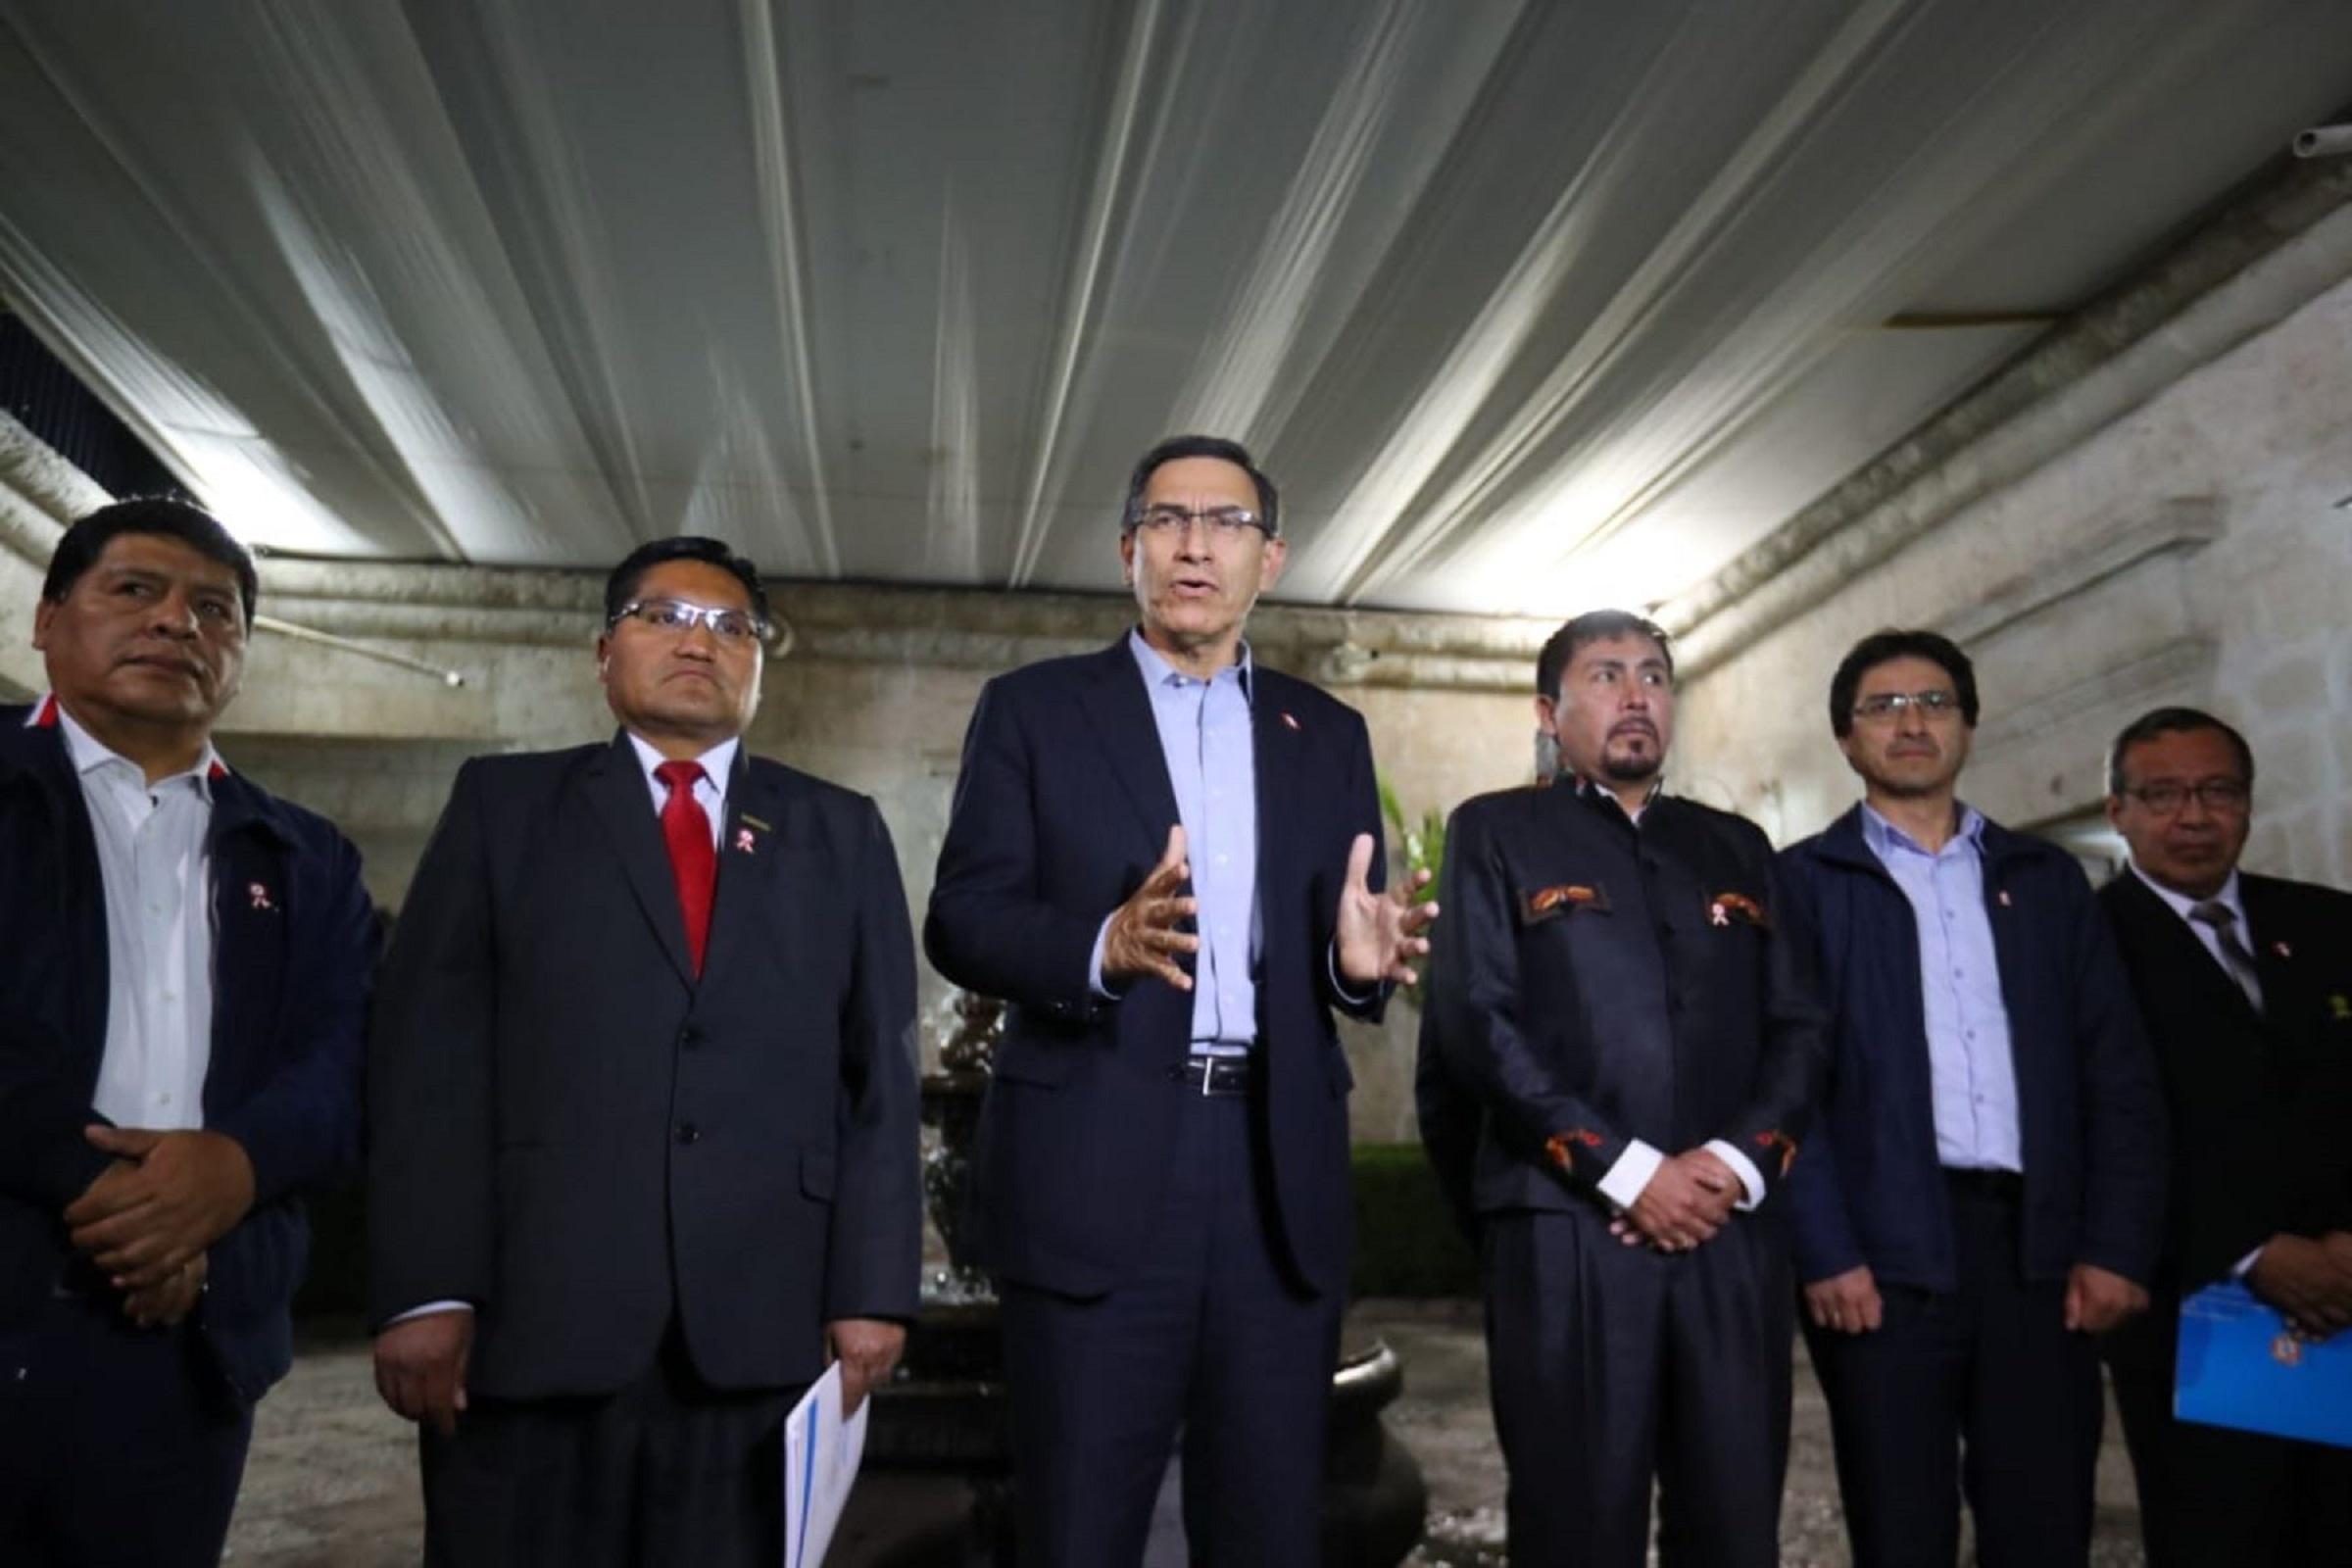 Presidente Vizcarra dice que diálogo con Gobernadores del sur fue positivo